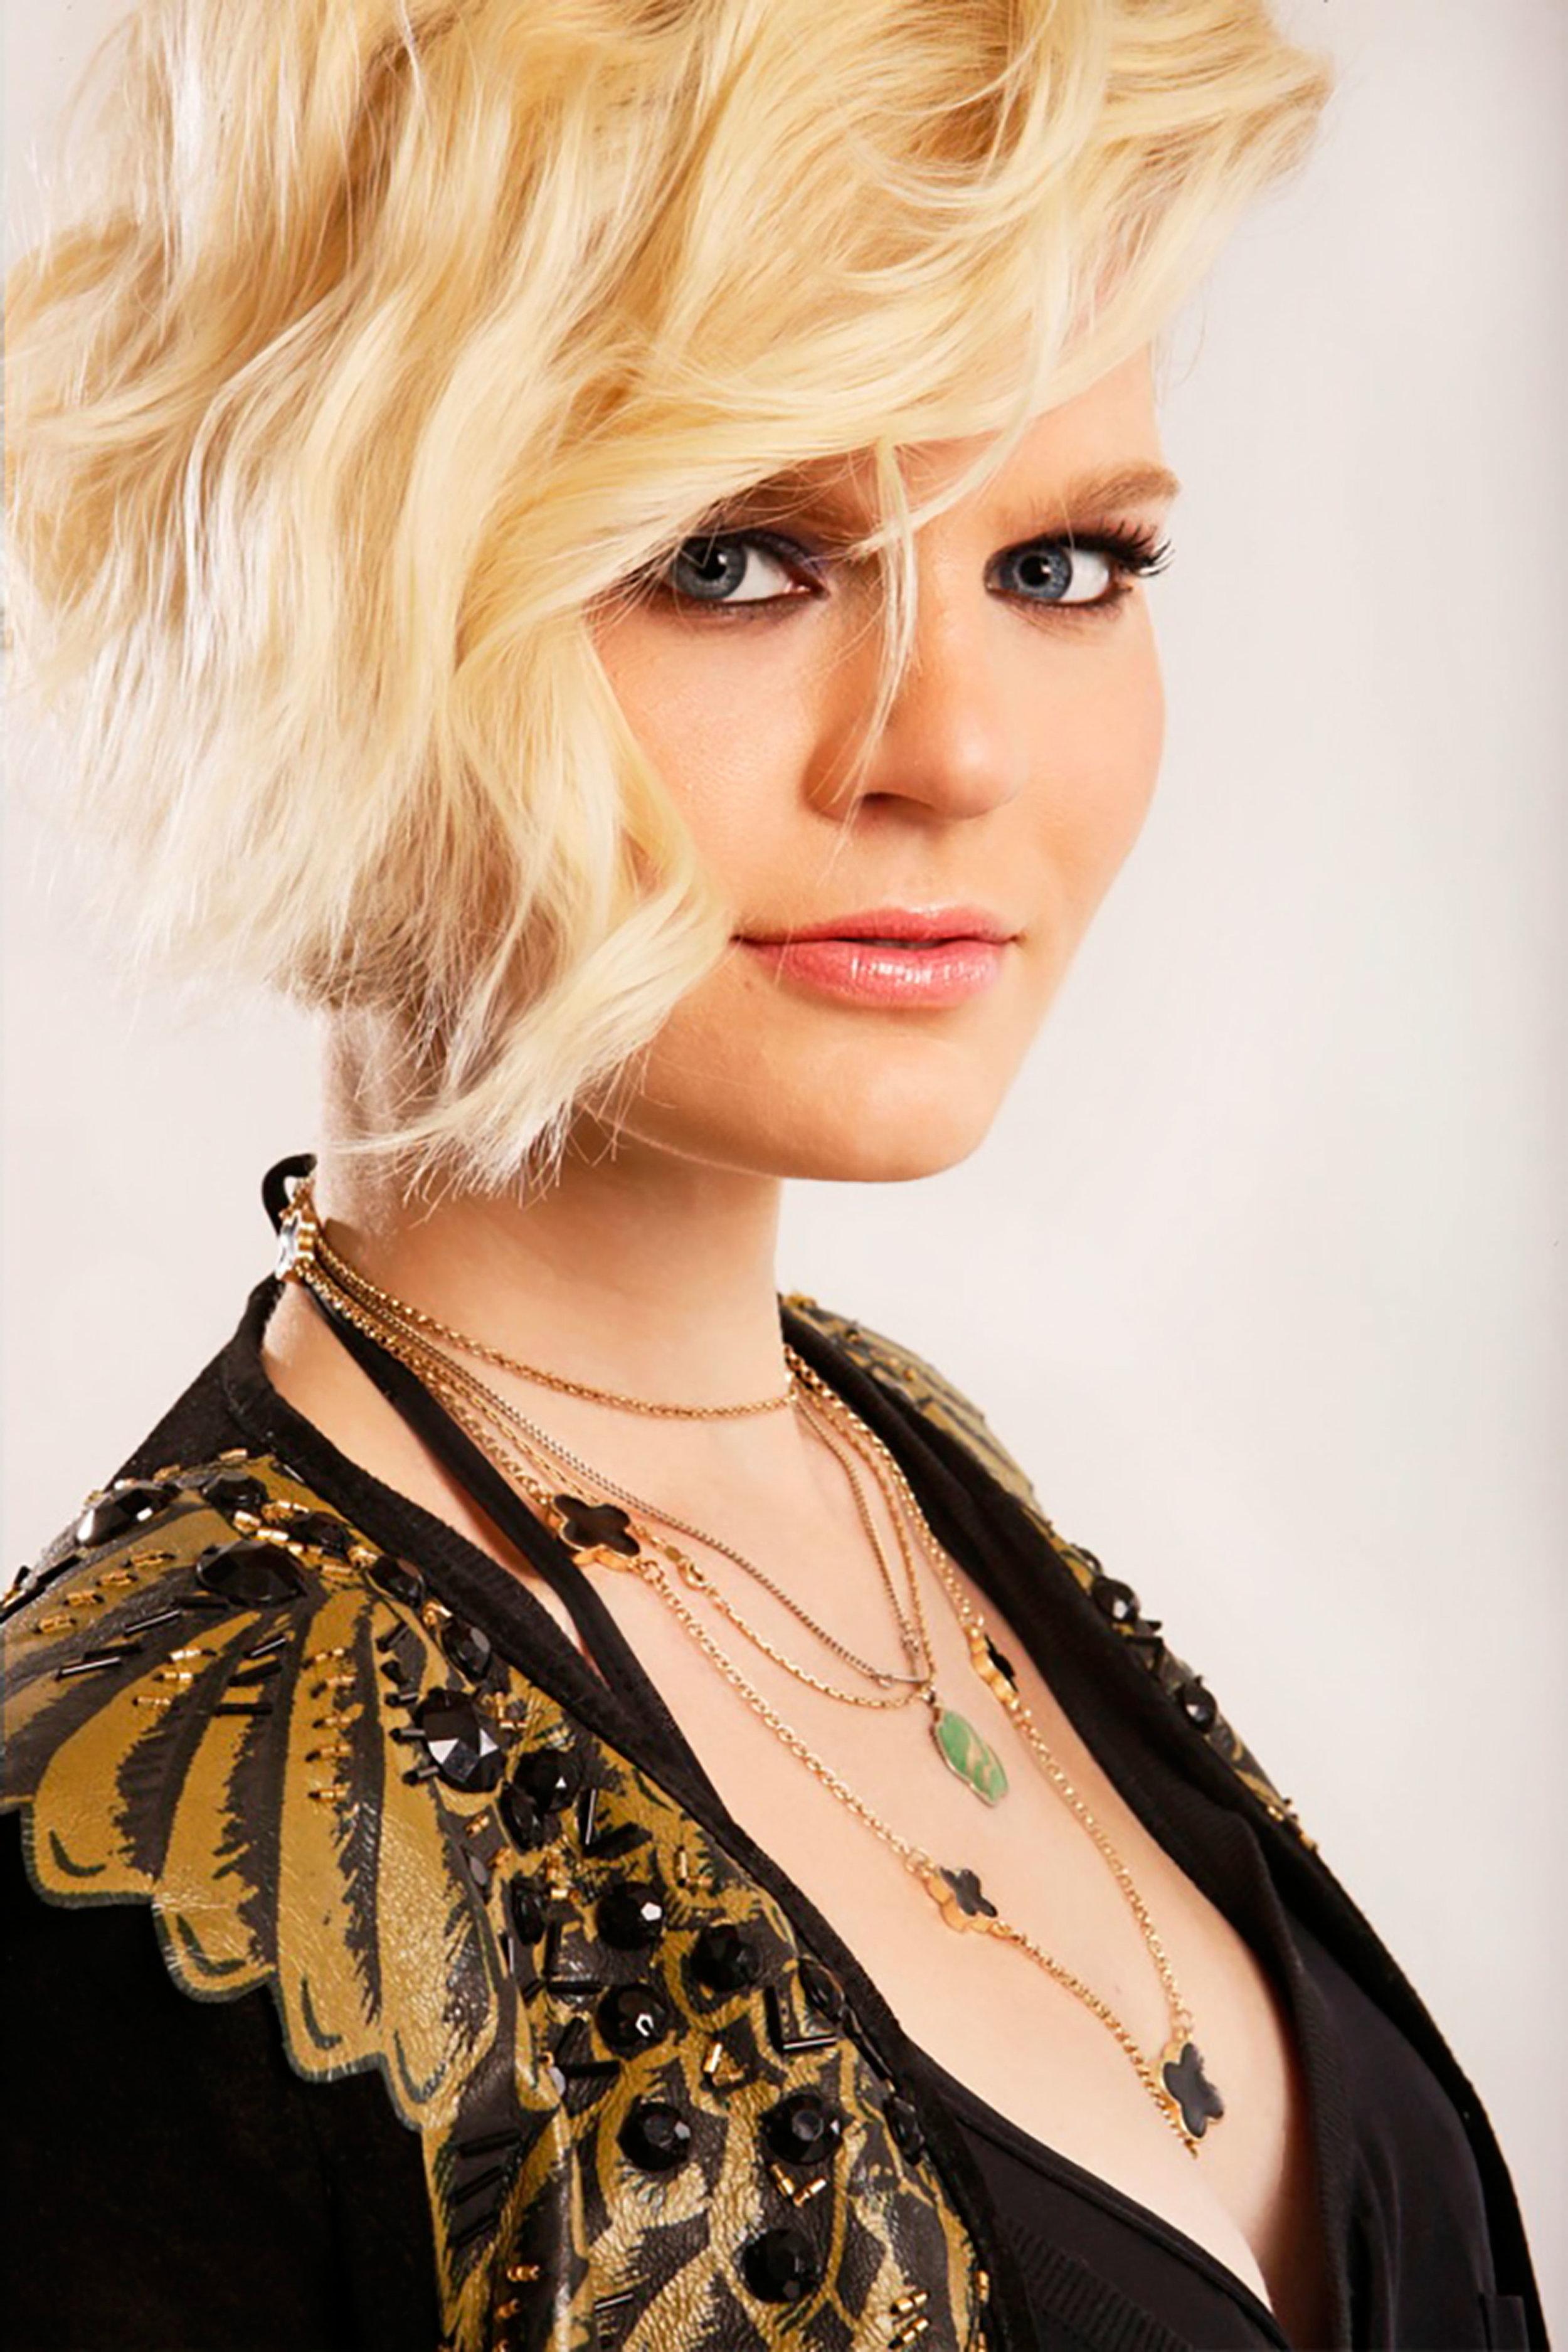 Cecilia Ammerman | model on America's Next Top Model